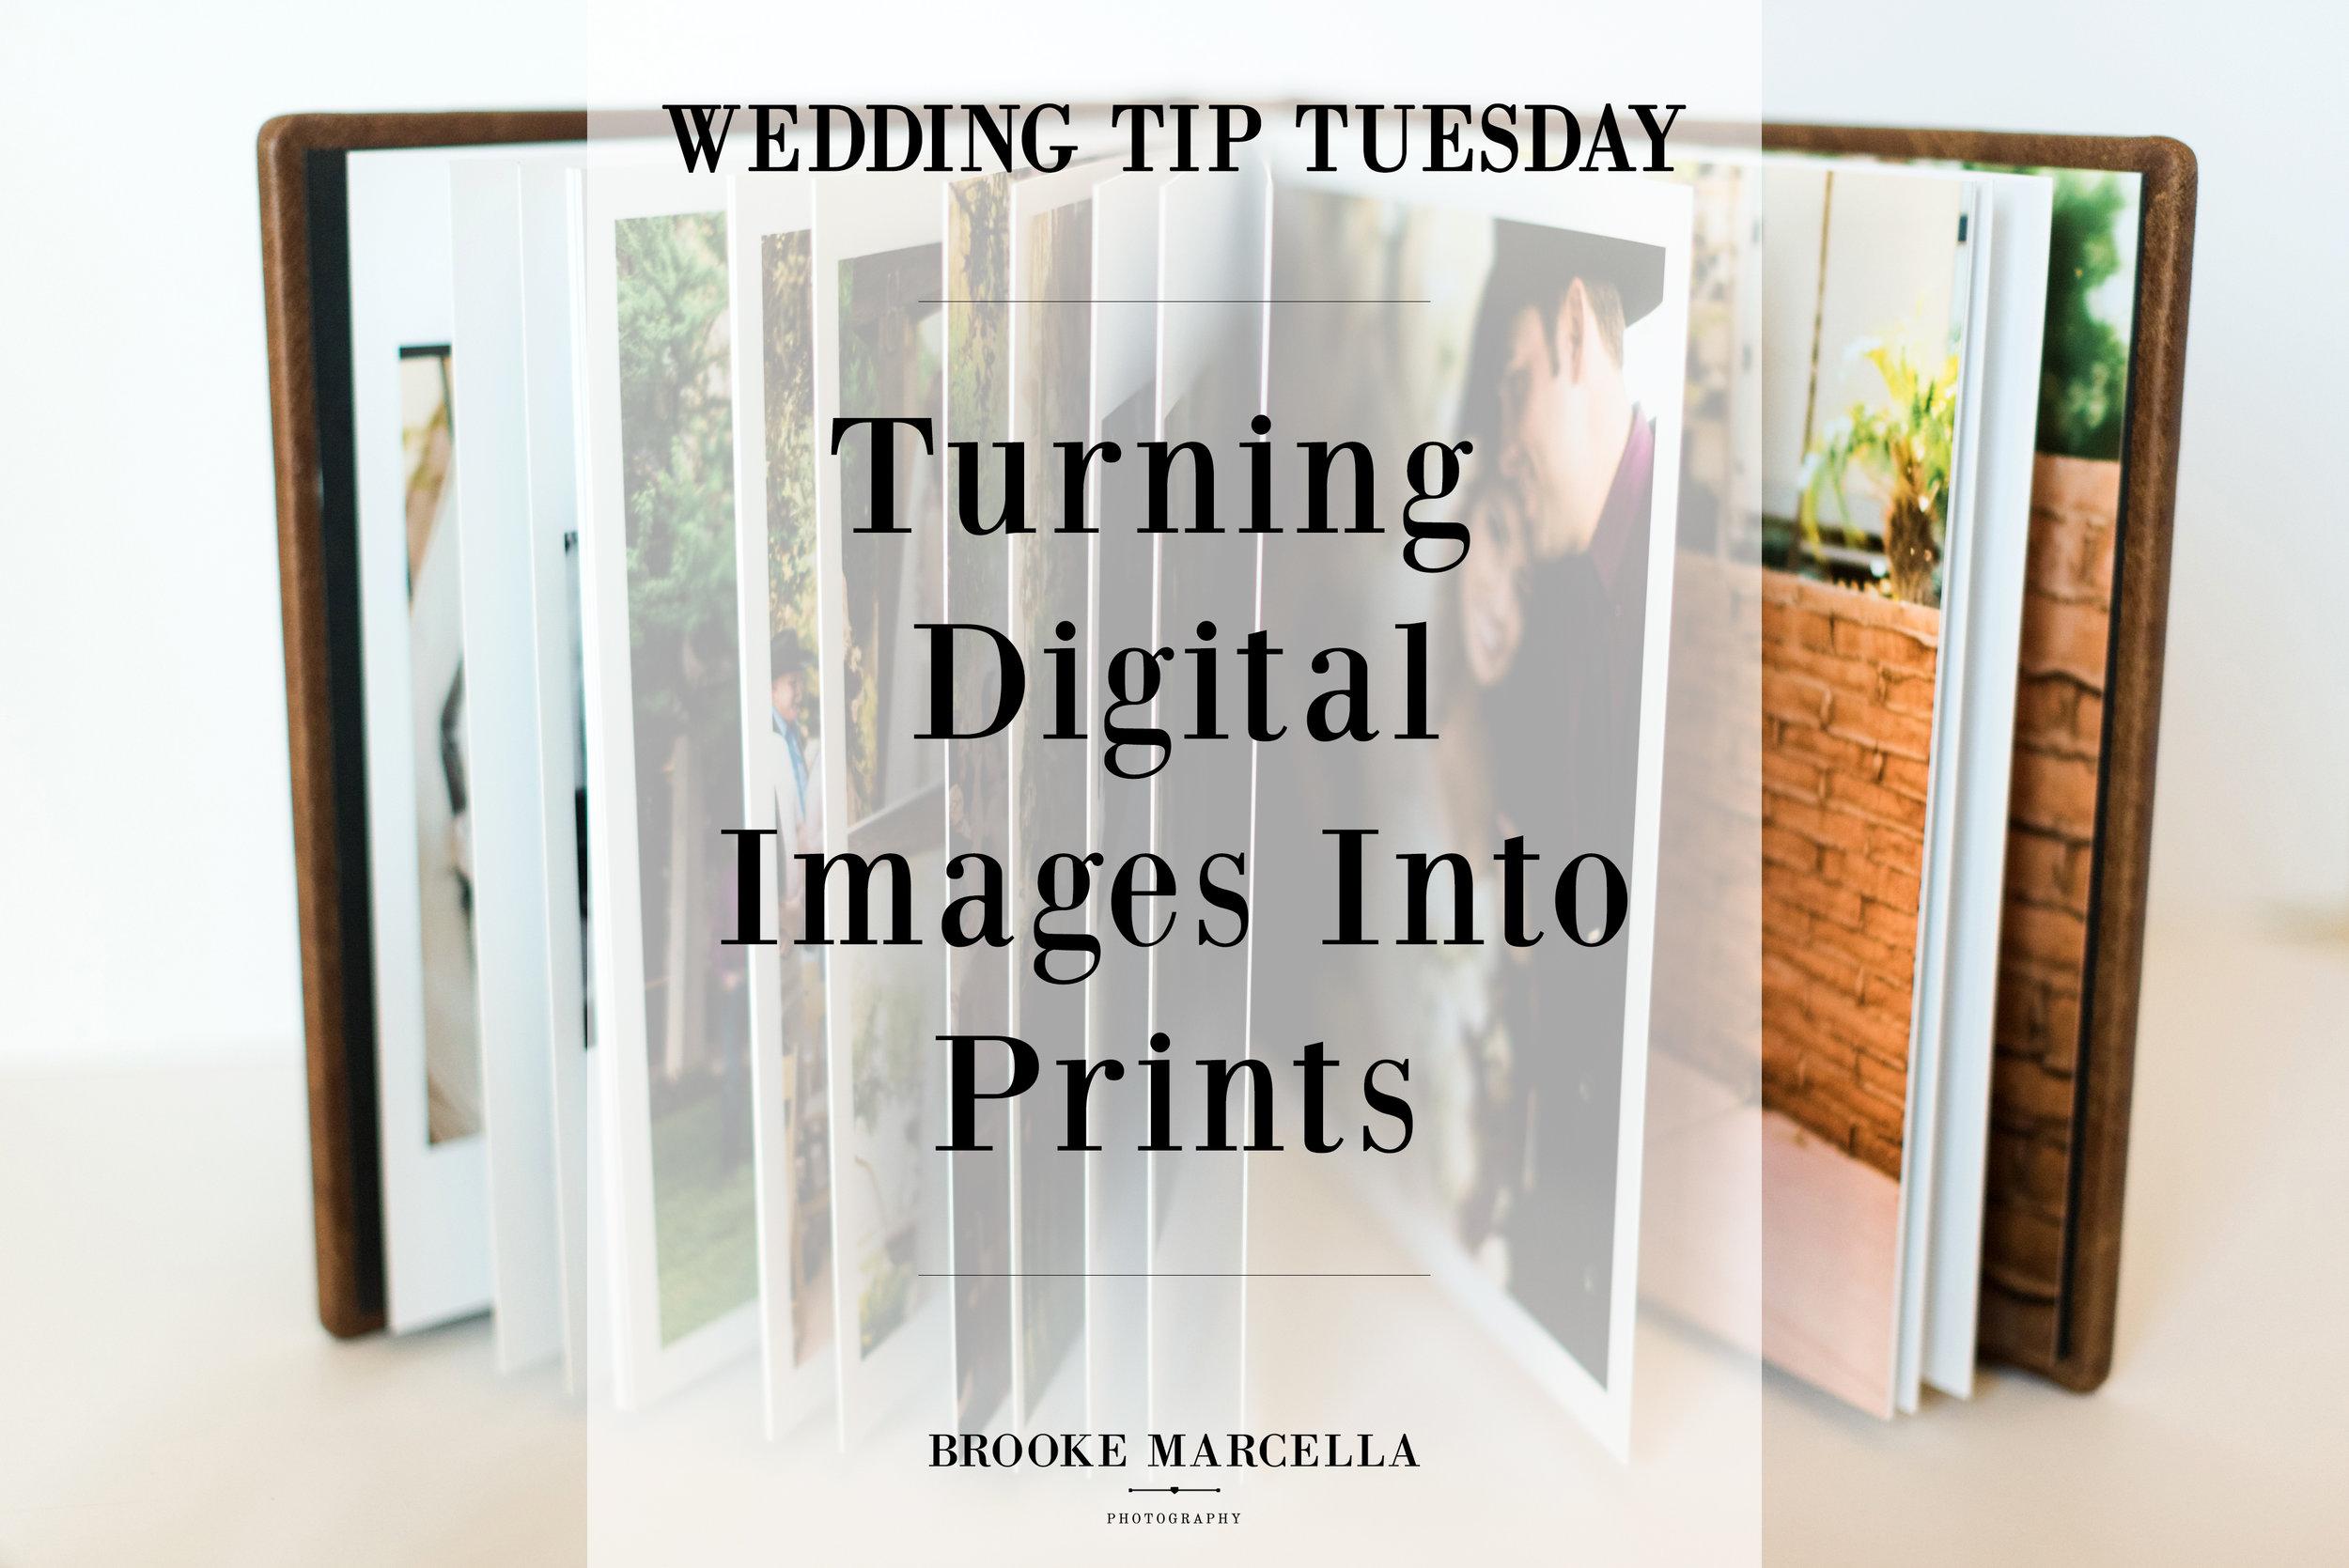 Turning digital wedding images into prints.